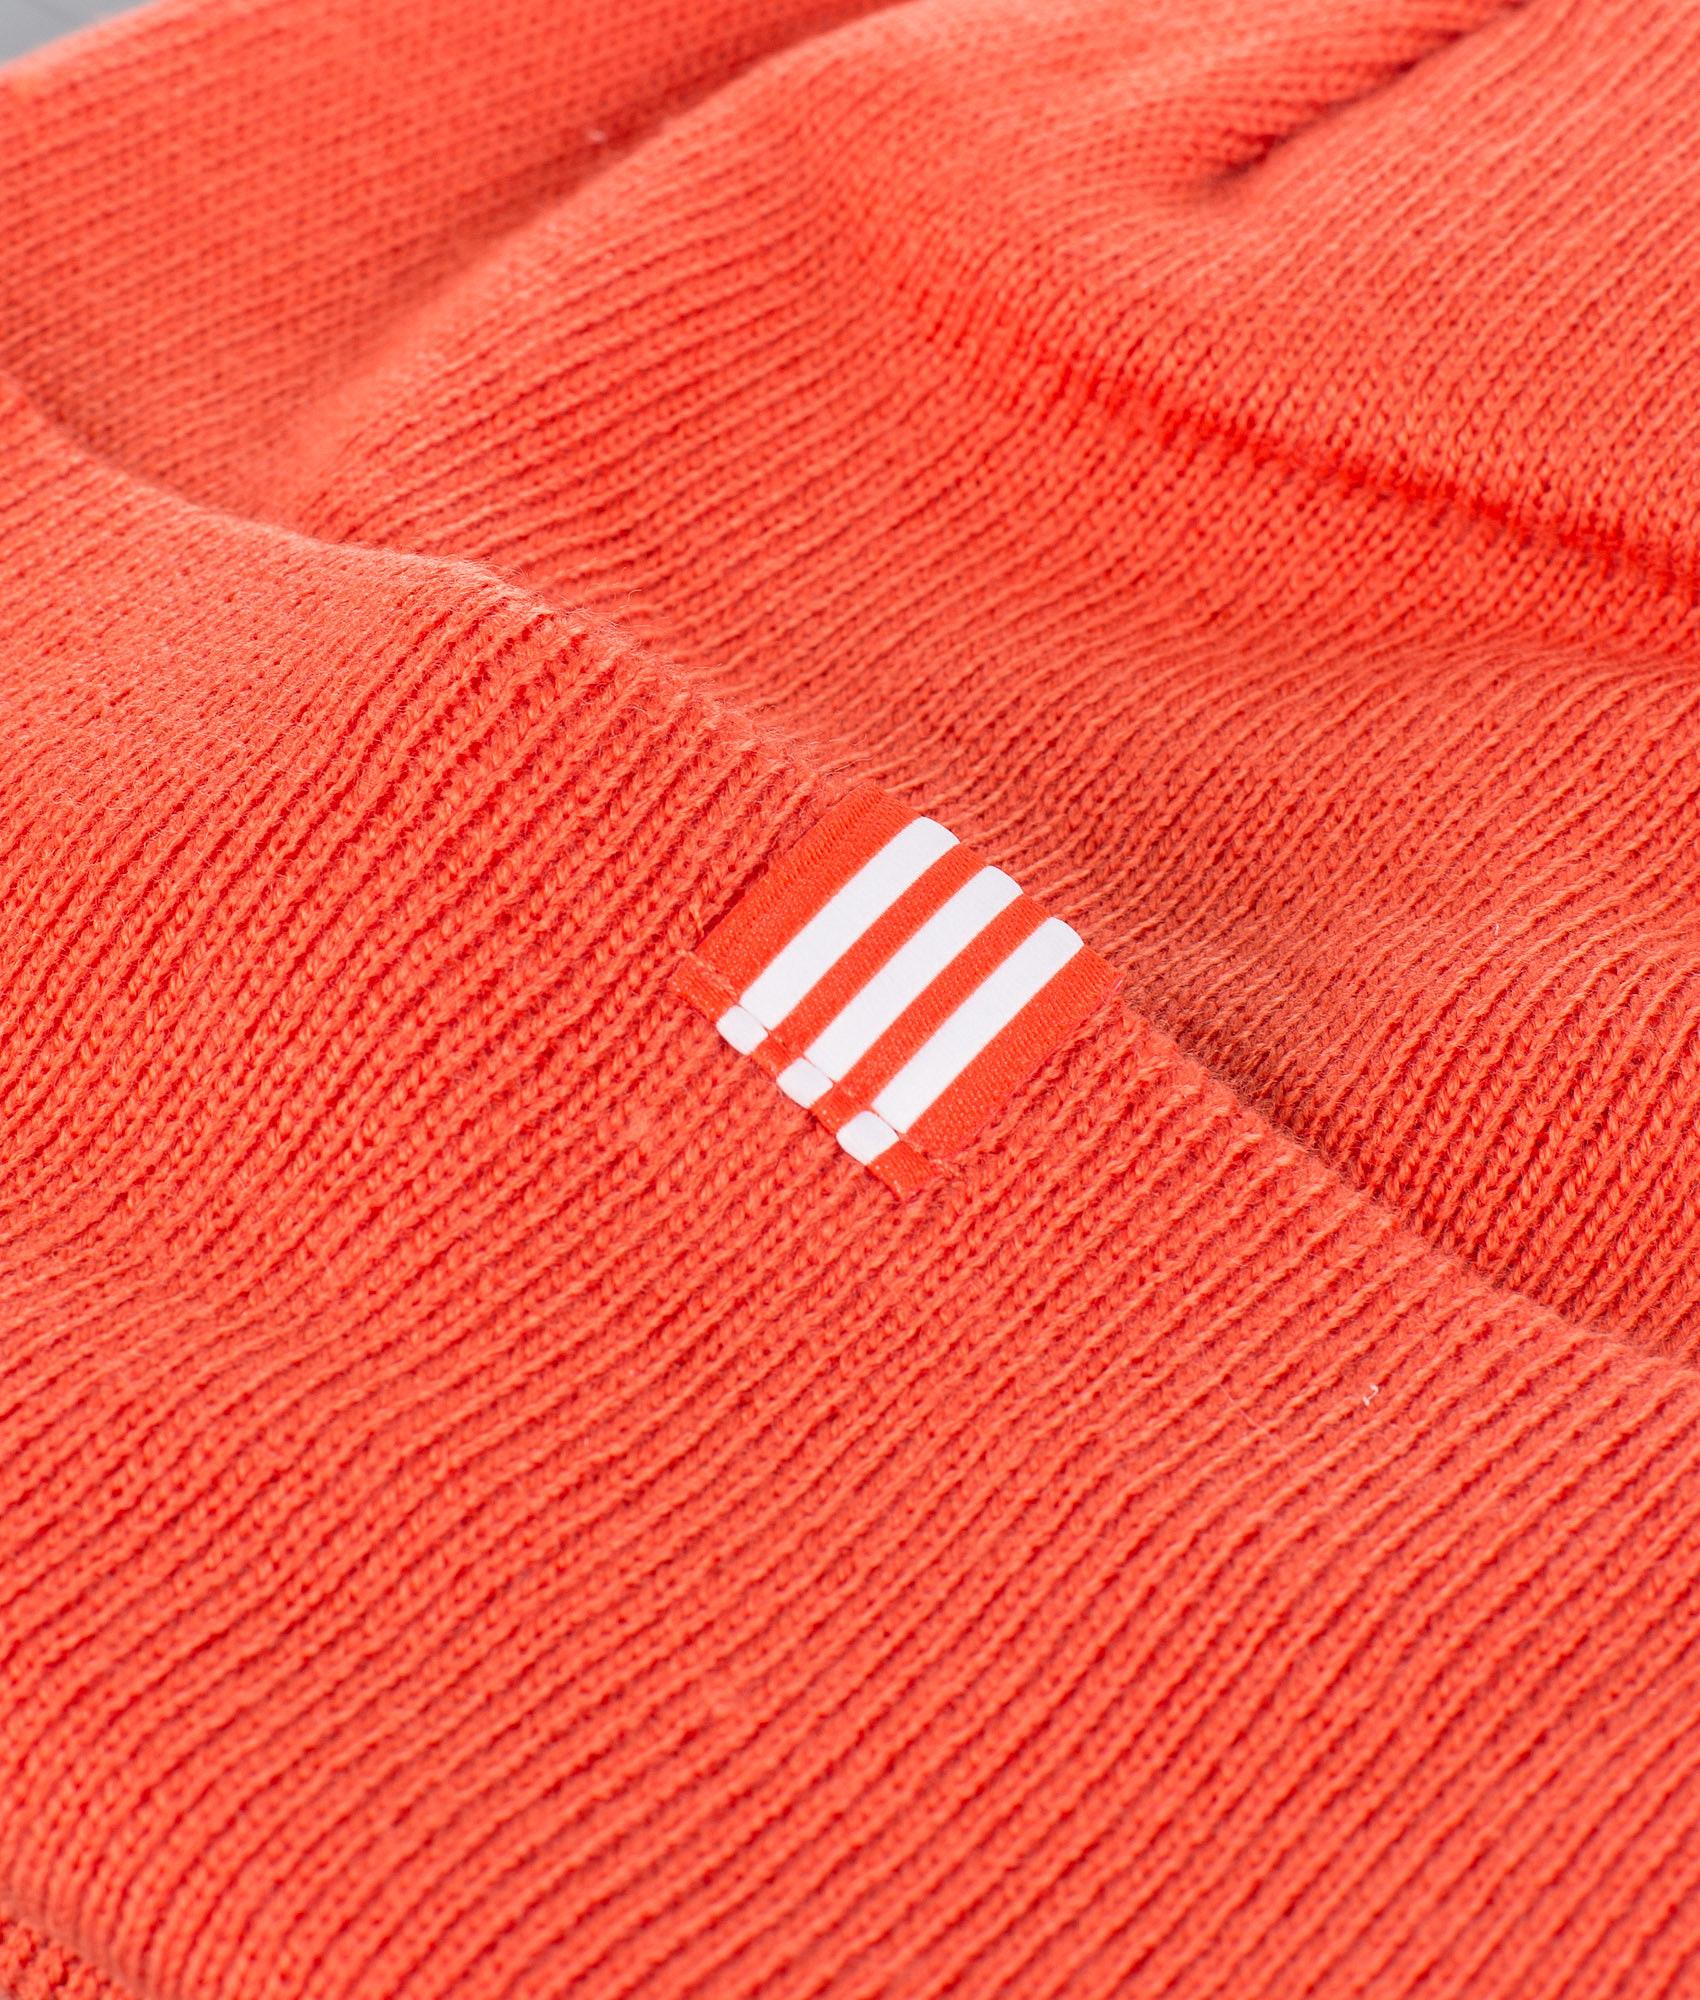 Adidas Originals Trefoil Mütze Raw Amber - Ridestore.ch b9ba6ec431